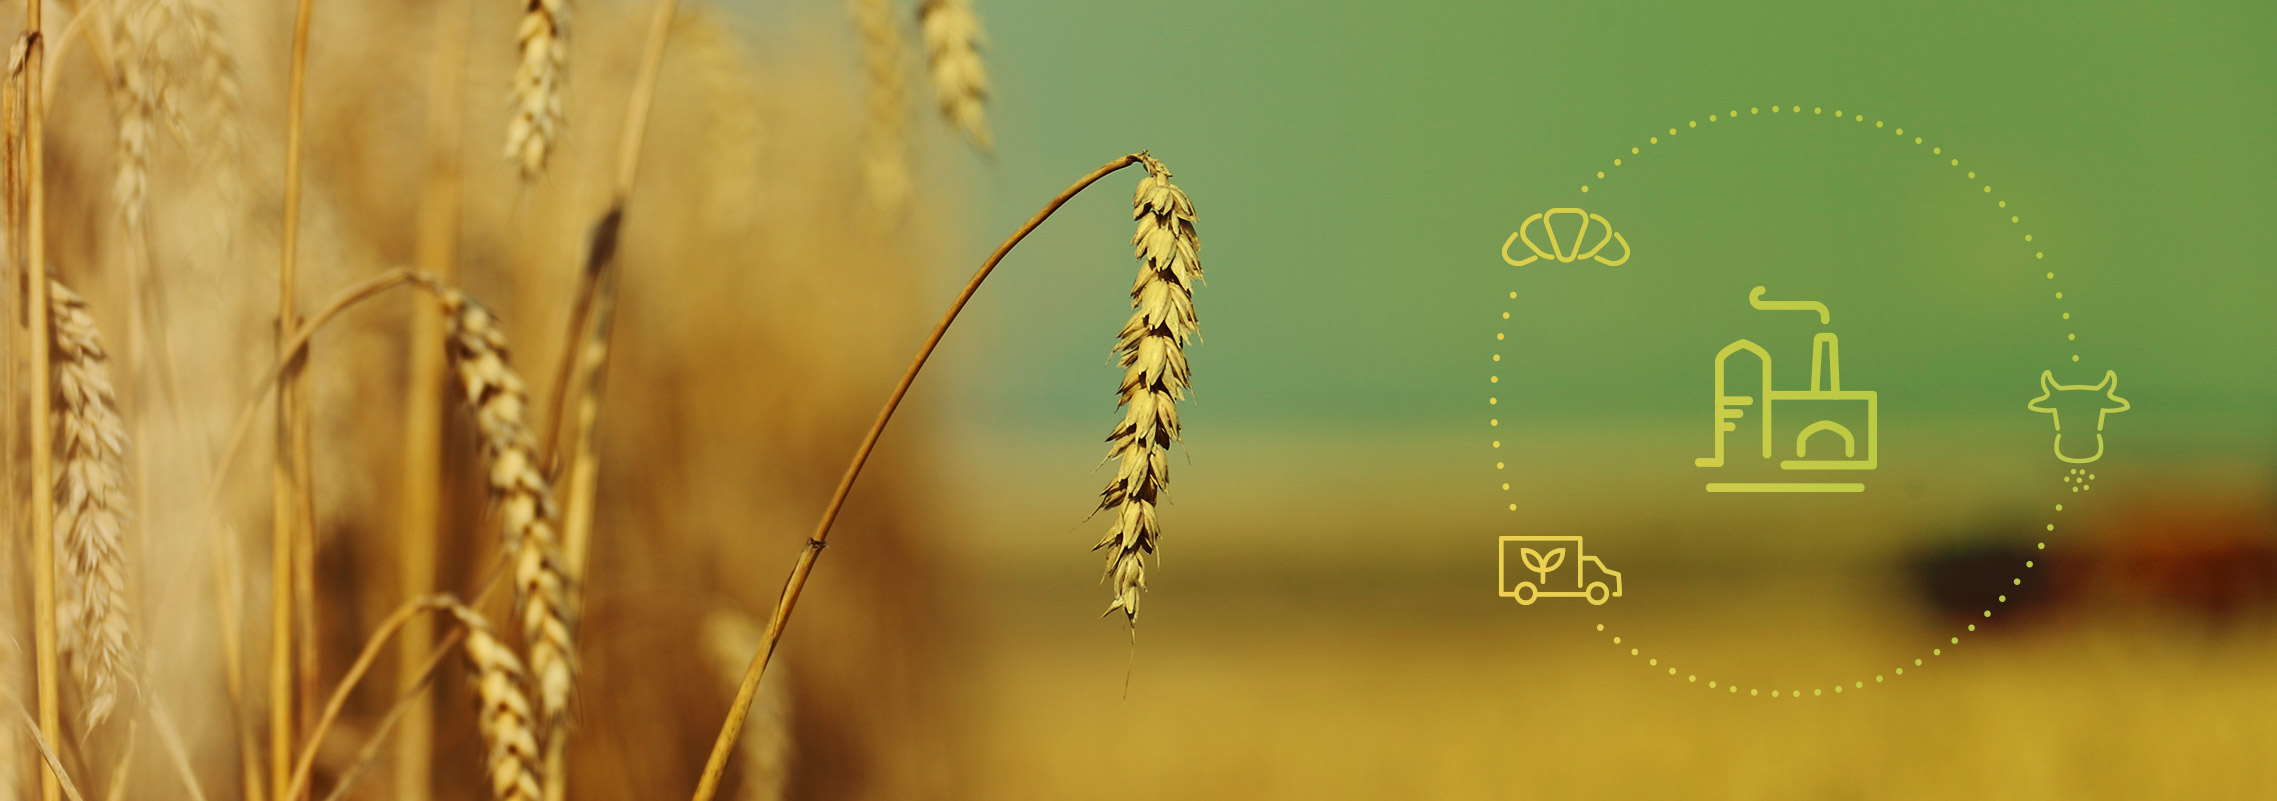 LUB - UBI - Sustainability - Food waste